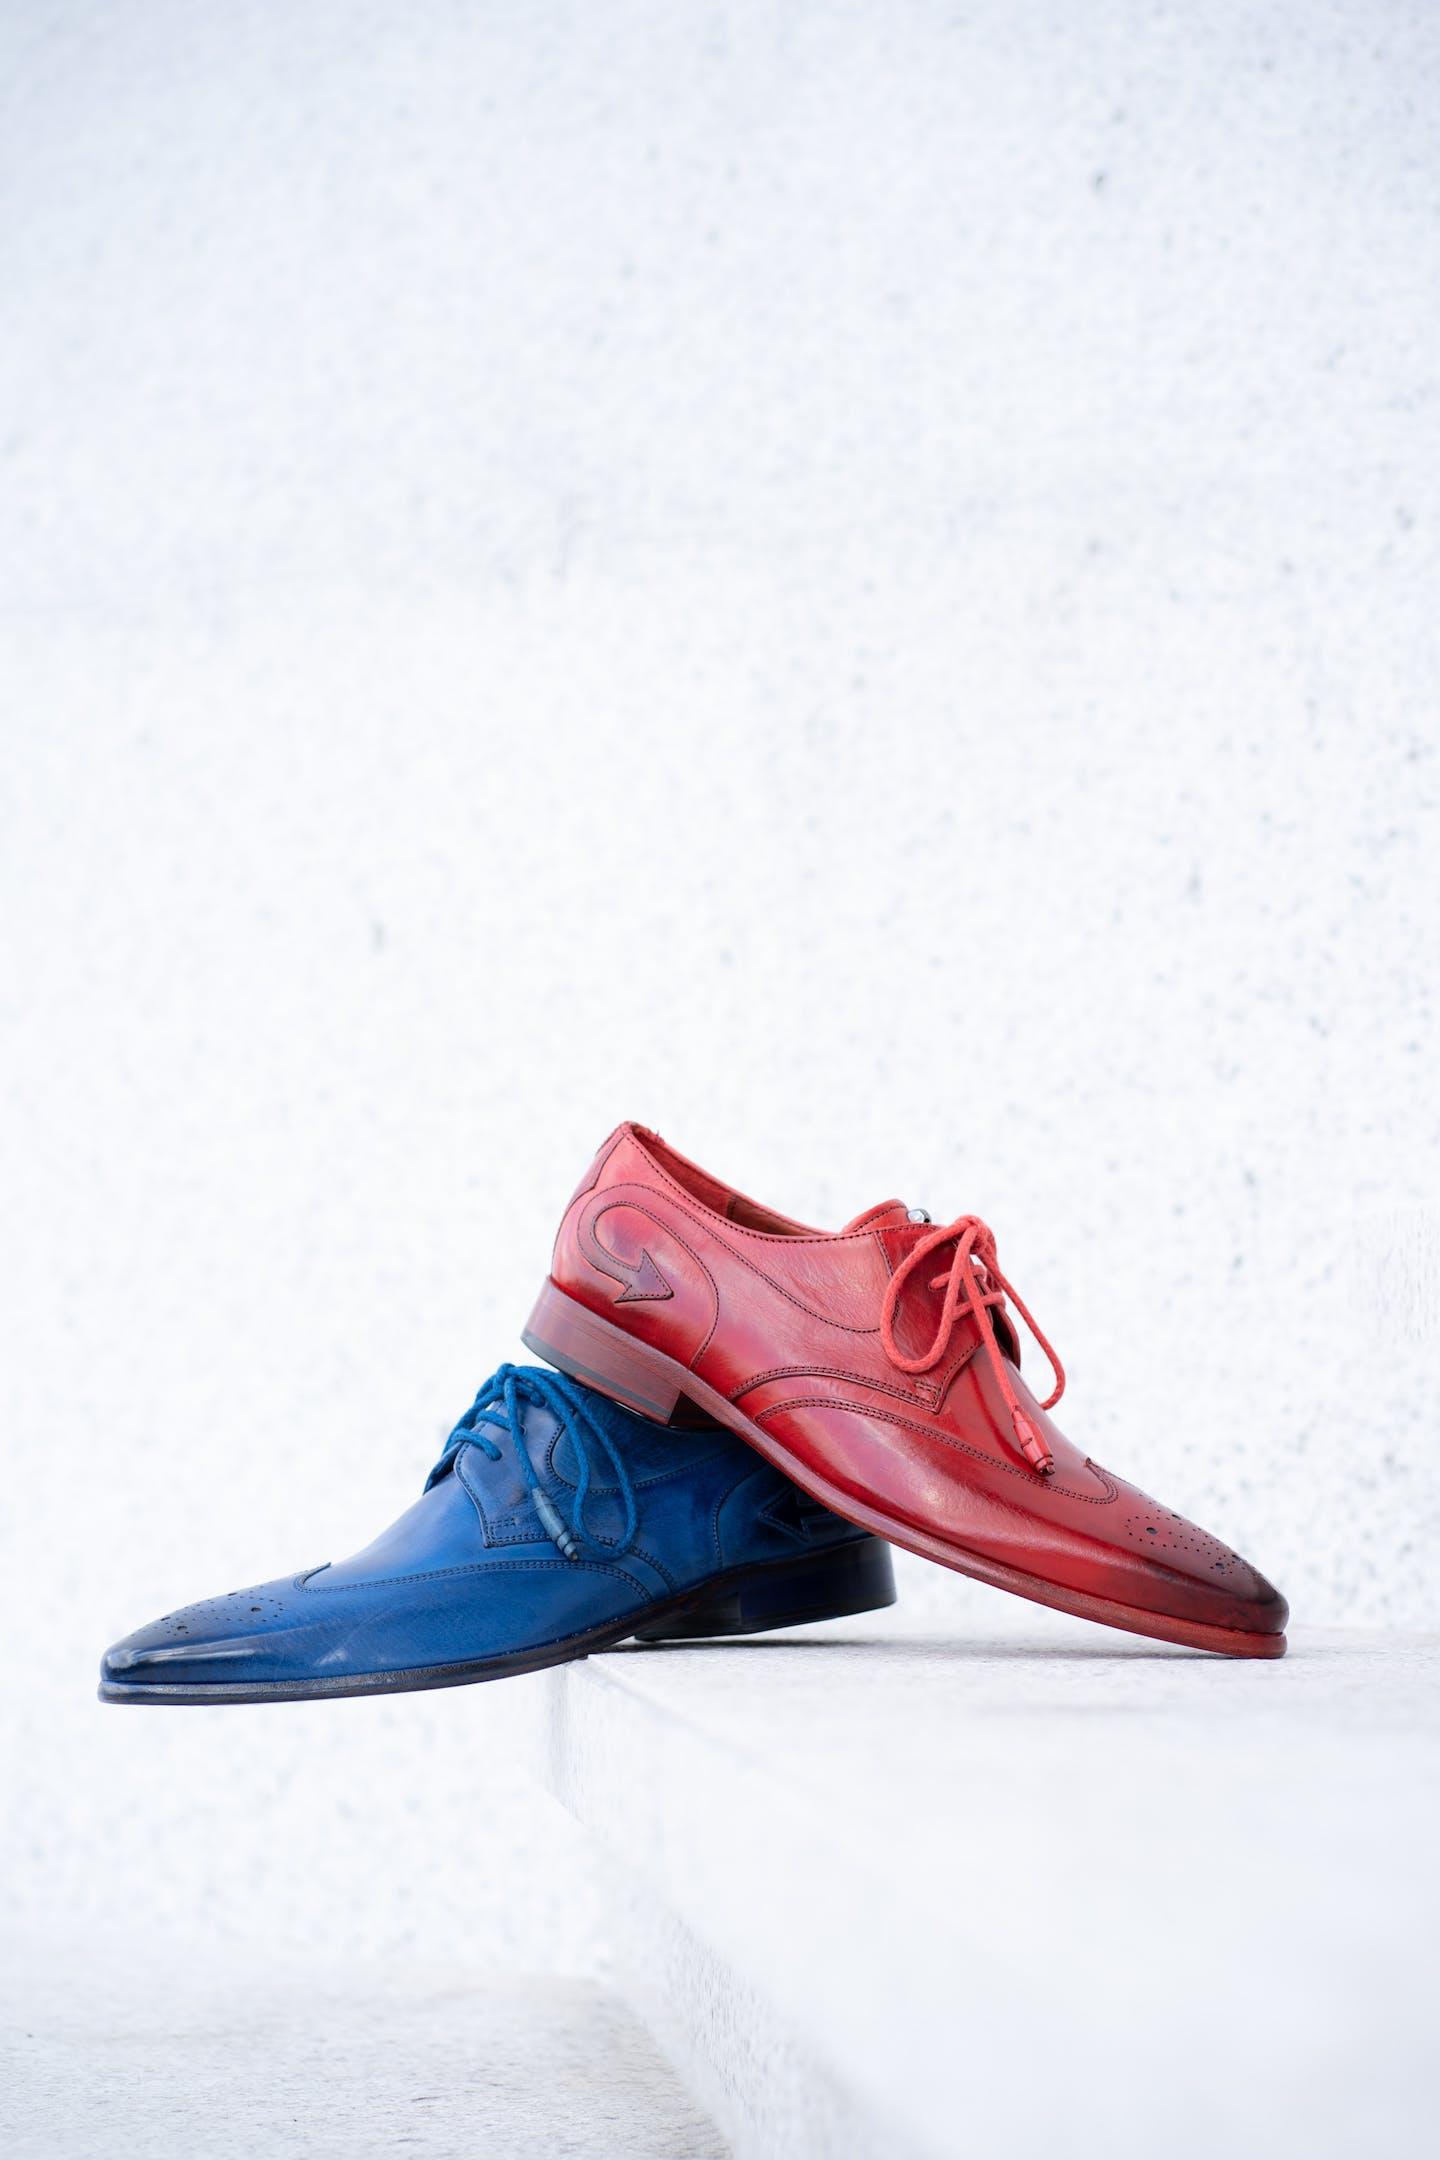 Men's colourful derby shoes by Melvin & Hamilton